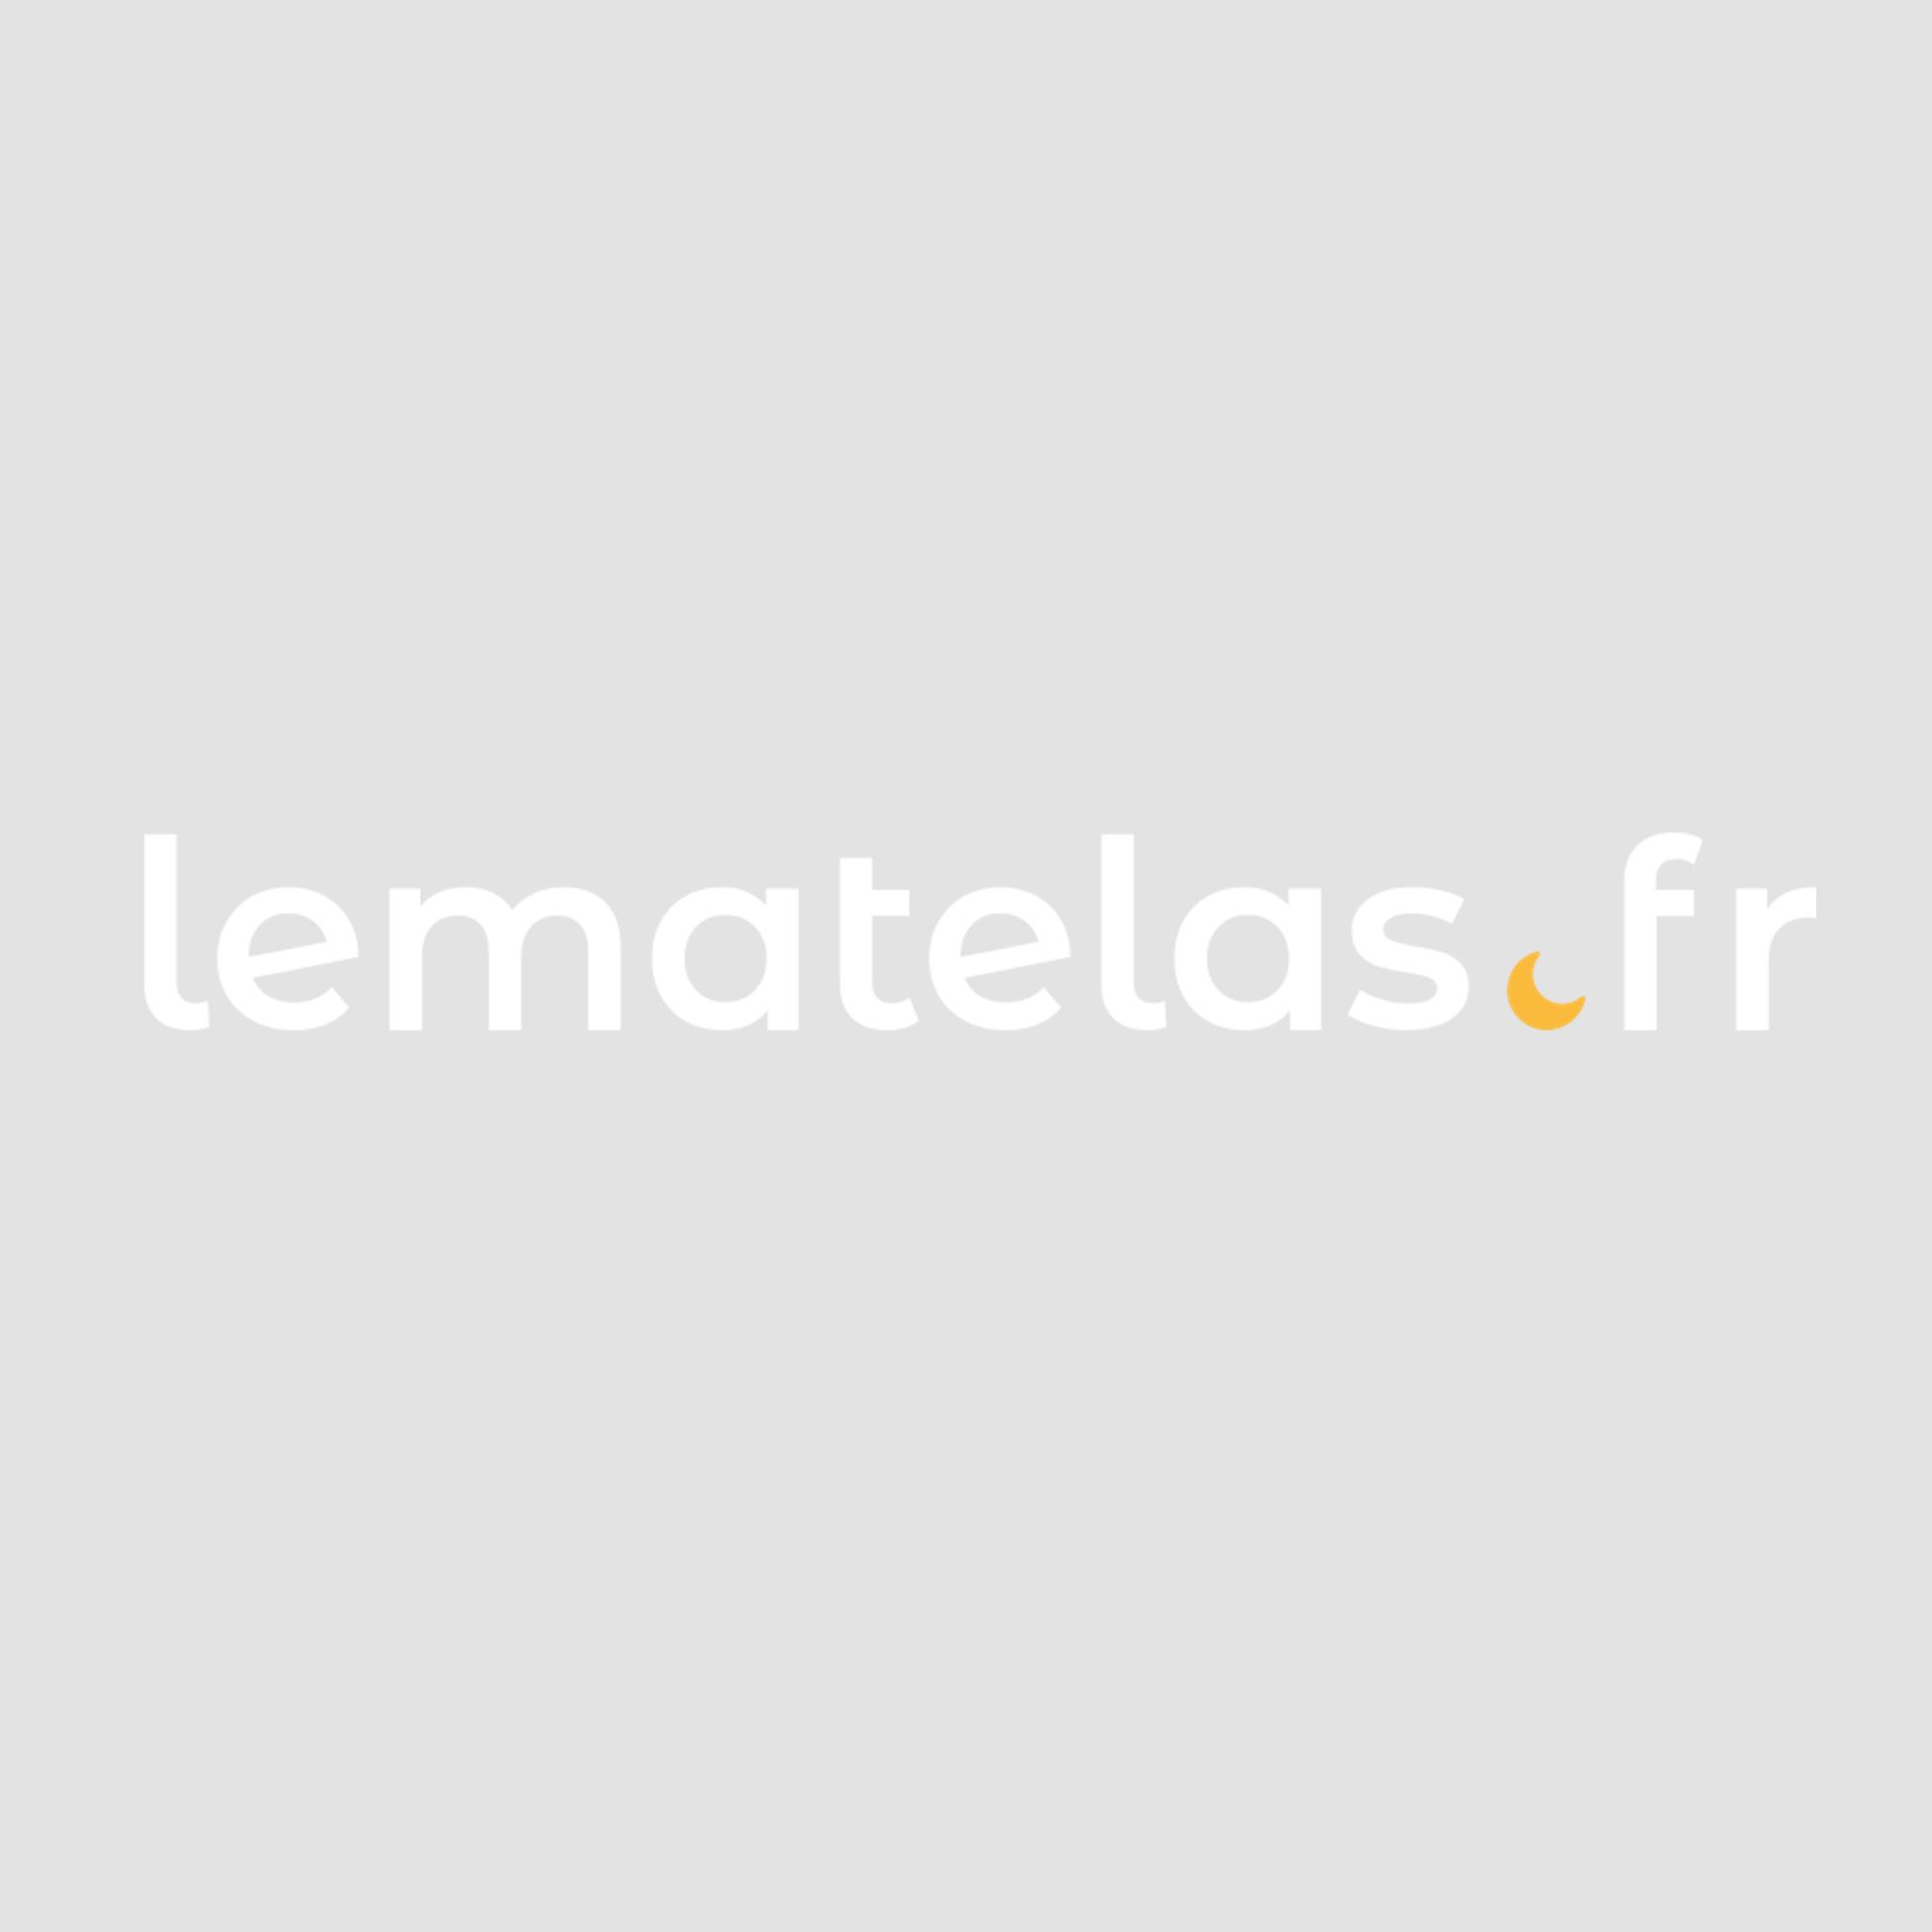 Bureau en bois rose avec tiroir central - BU6006